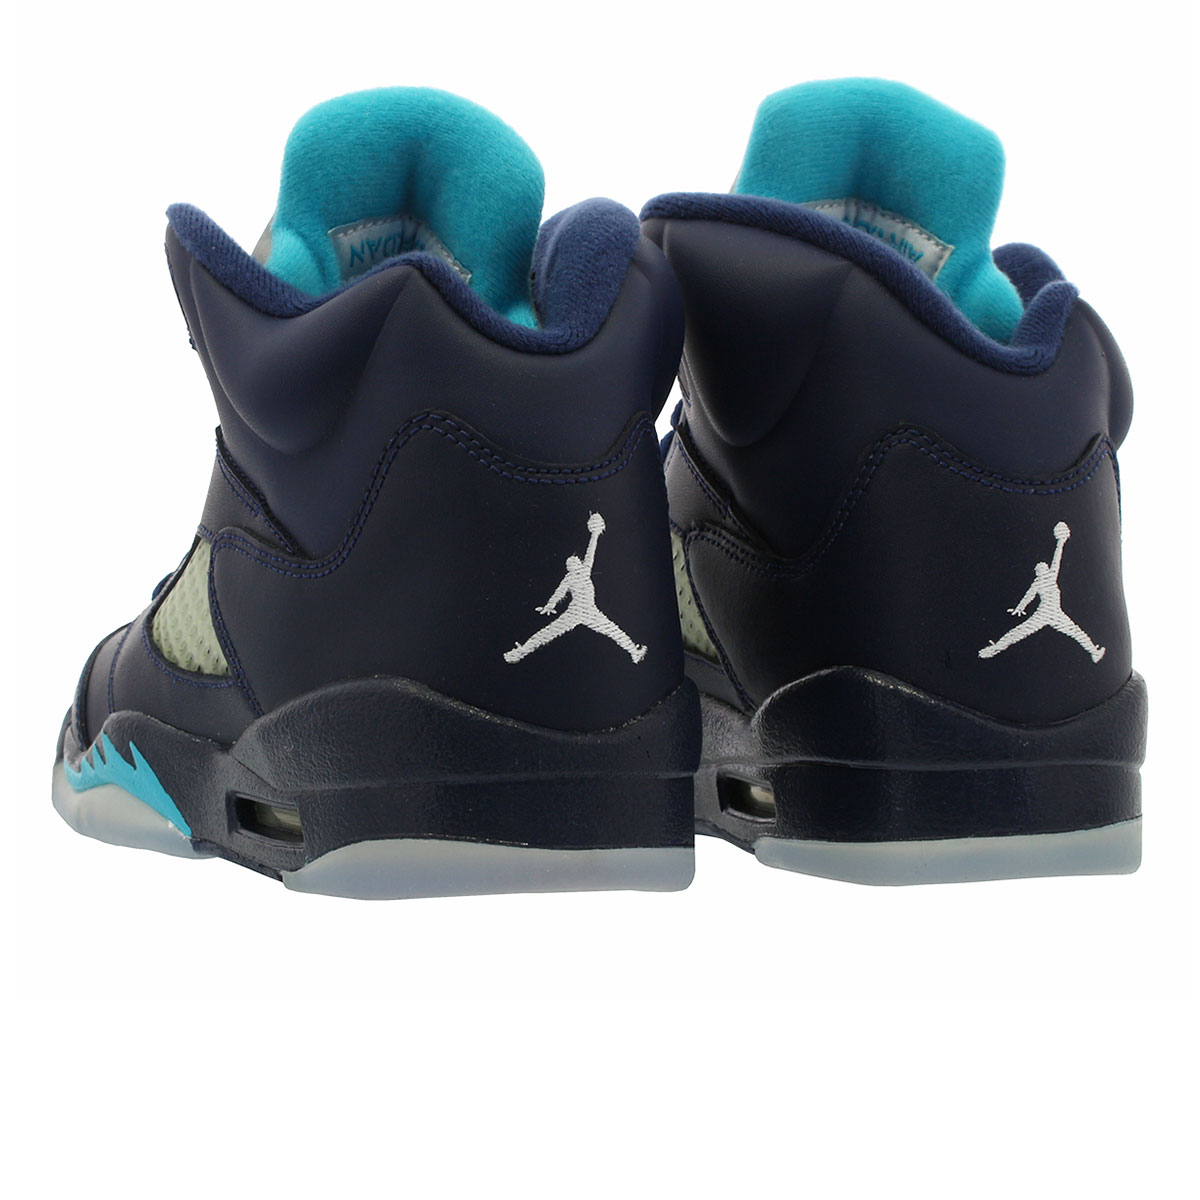 online store d26a7 52e14 ... NIKE AIR JORDAN 5 RETRO BG Nike Air Jordan 5 nostalgic BG MIDNIGHT NAVY TURQUOISE  ...